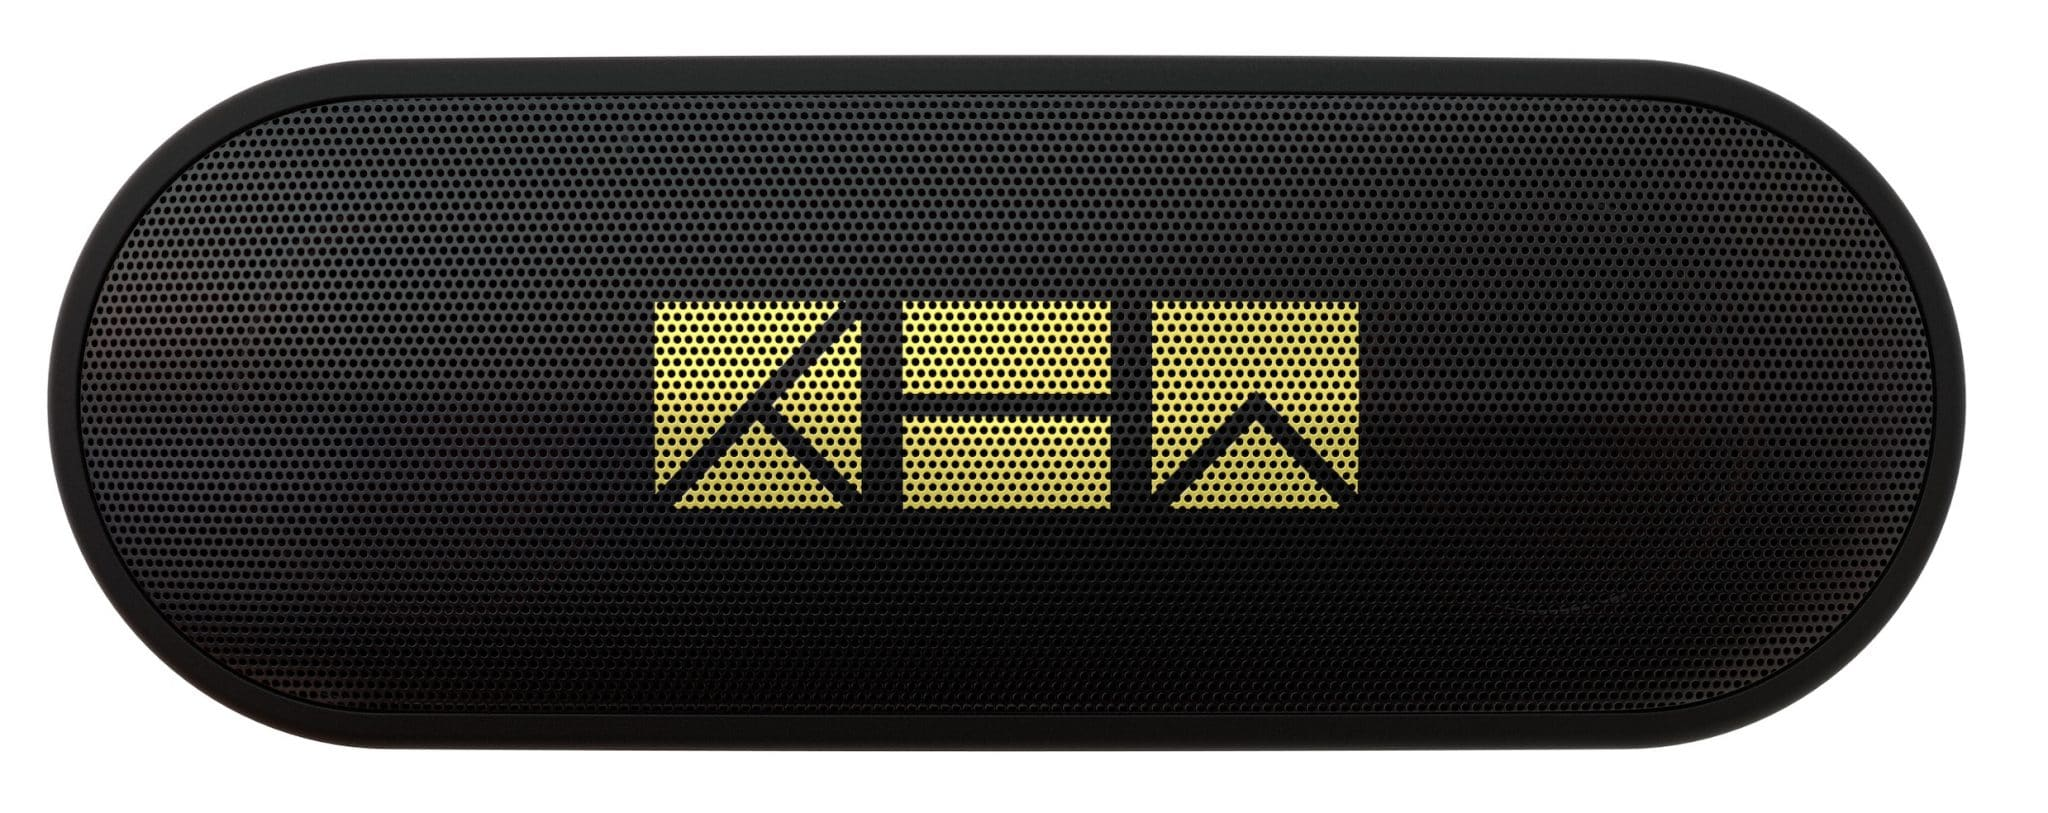 K1 Bluetooth speaker From Kew Labs